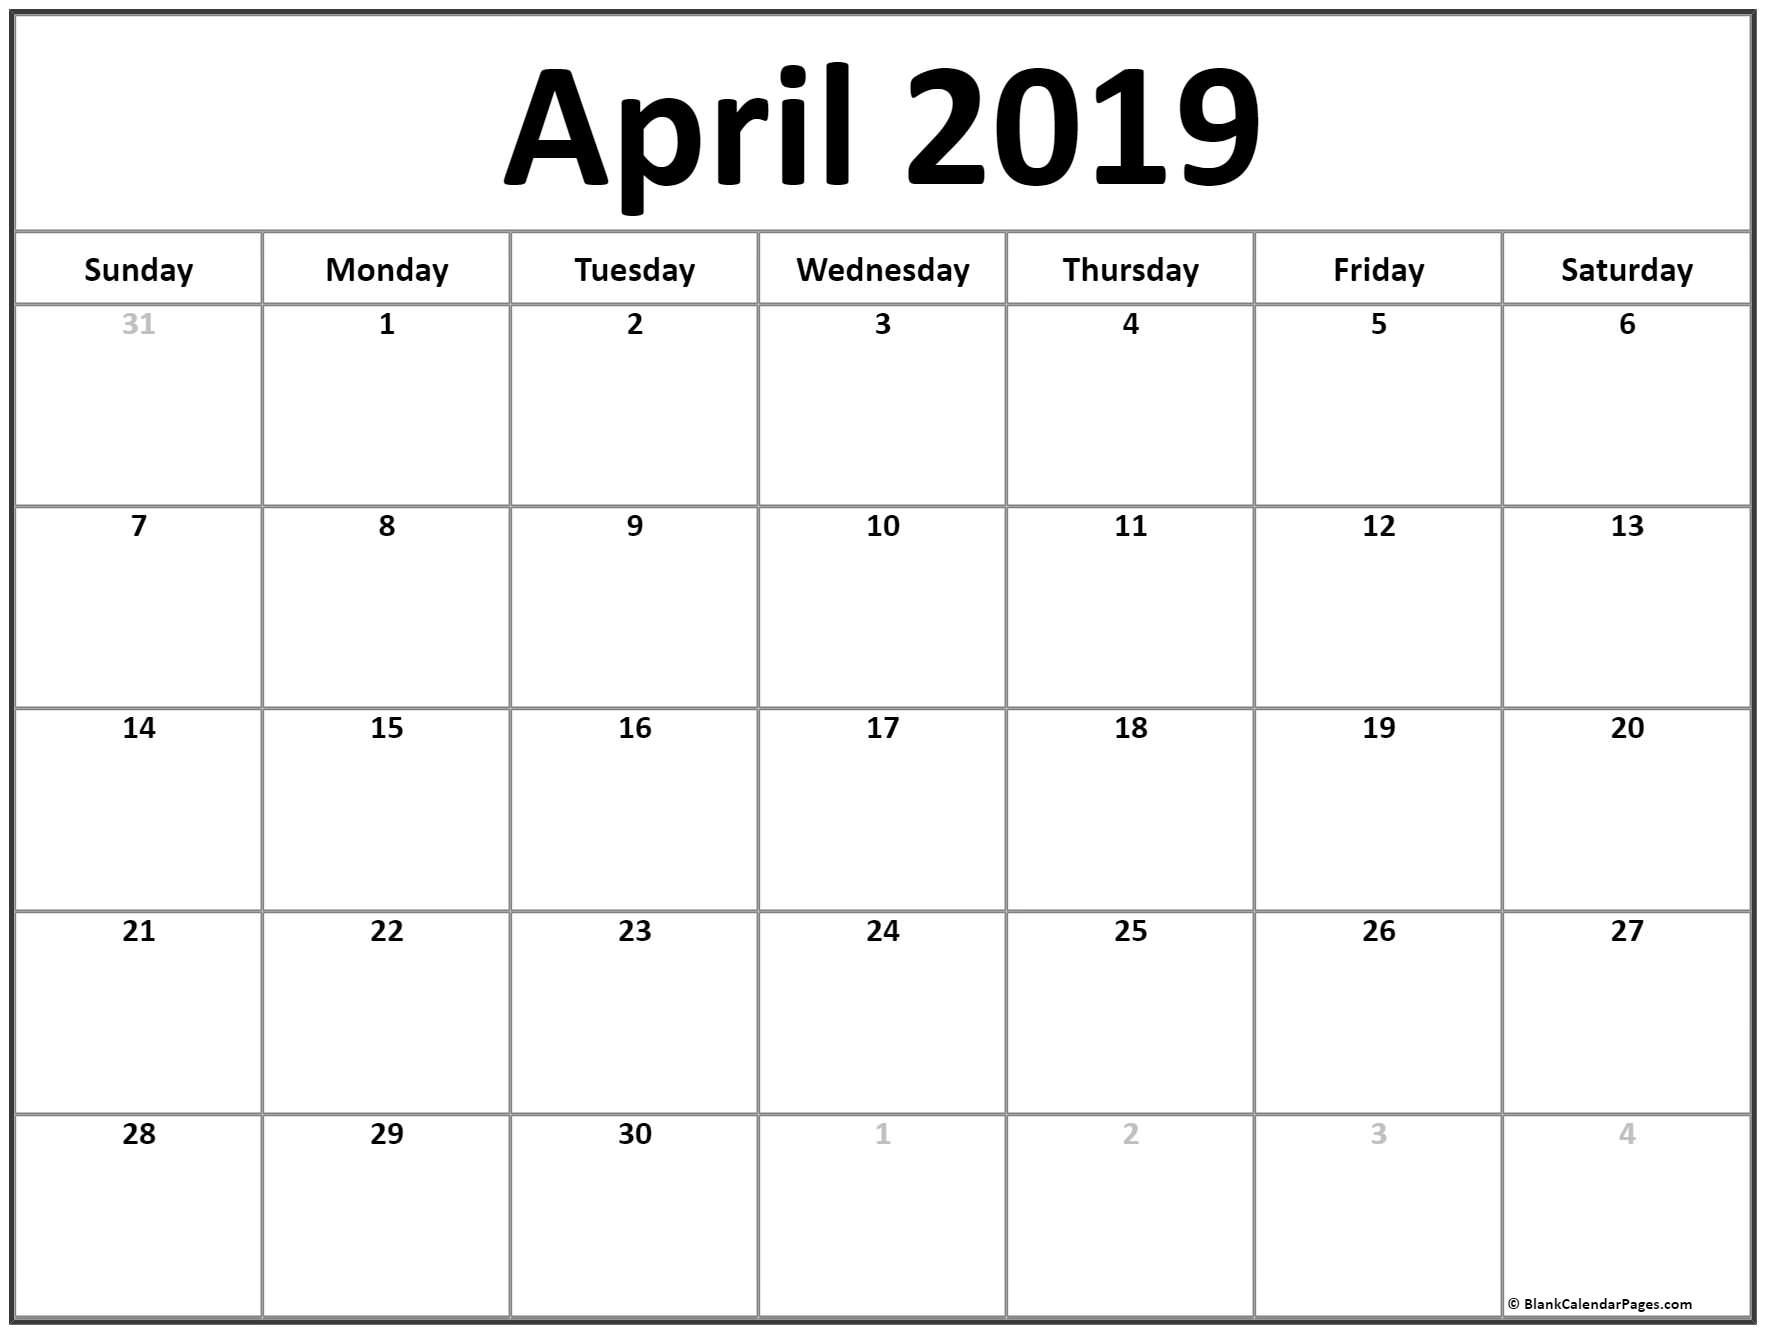 April 2019 Calendar | Free Printable Monthly Calendars for Mini Blank June And July Calendar